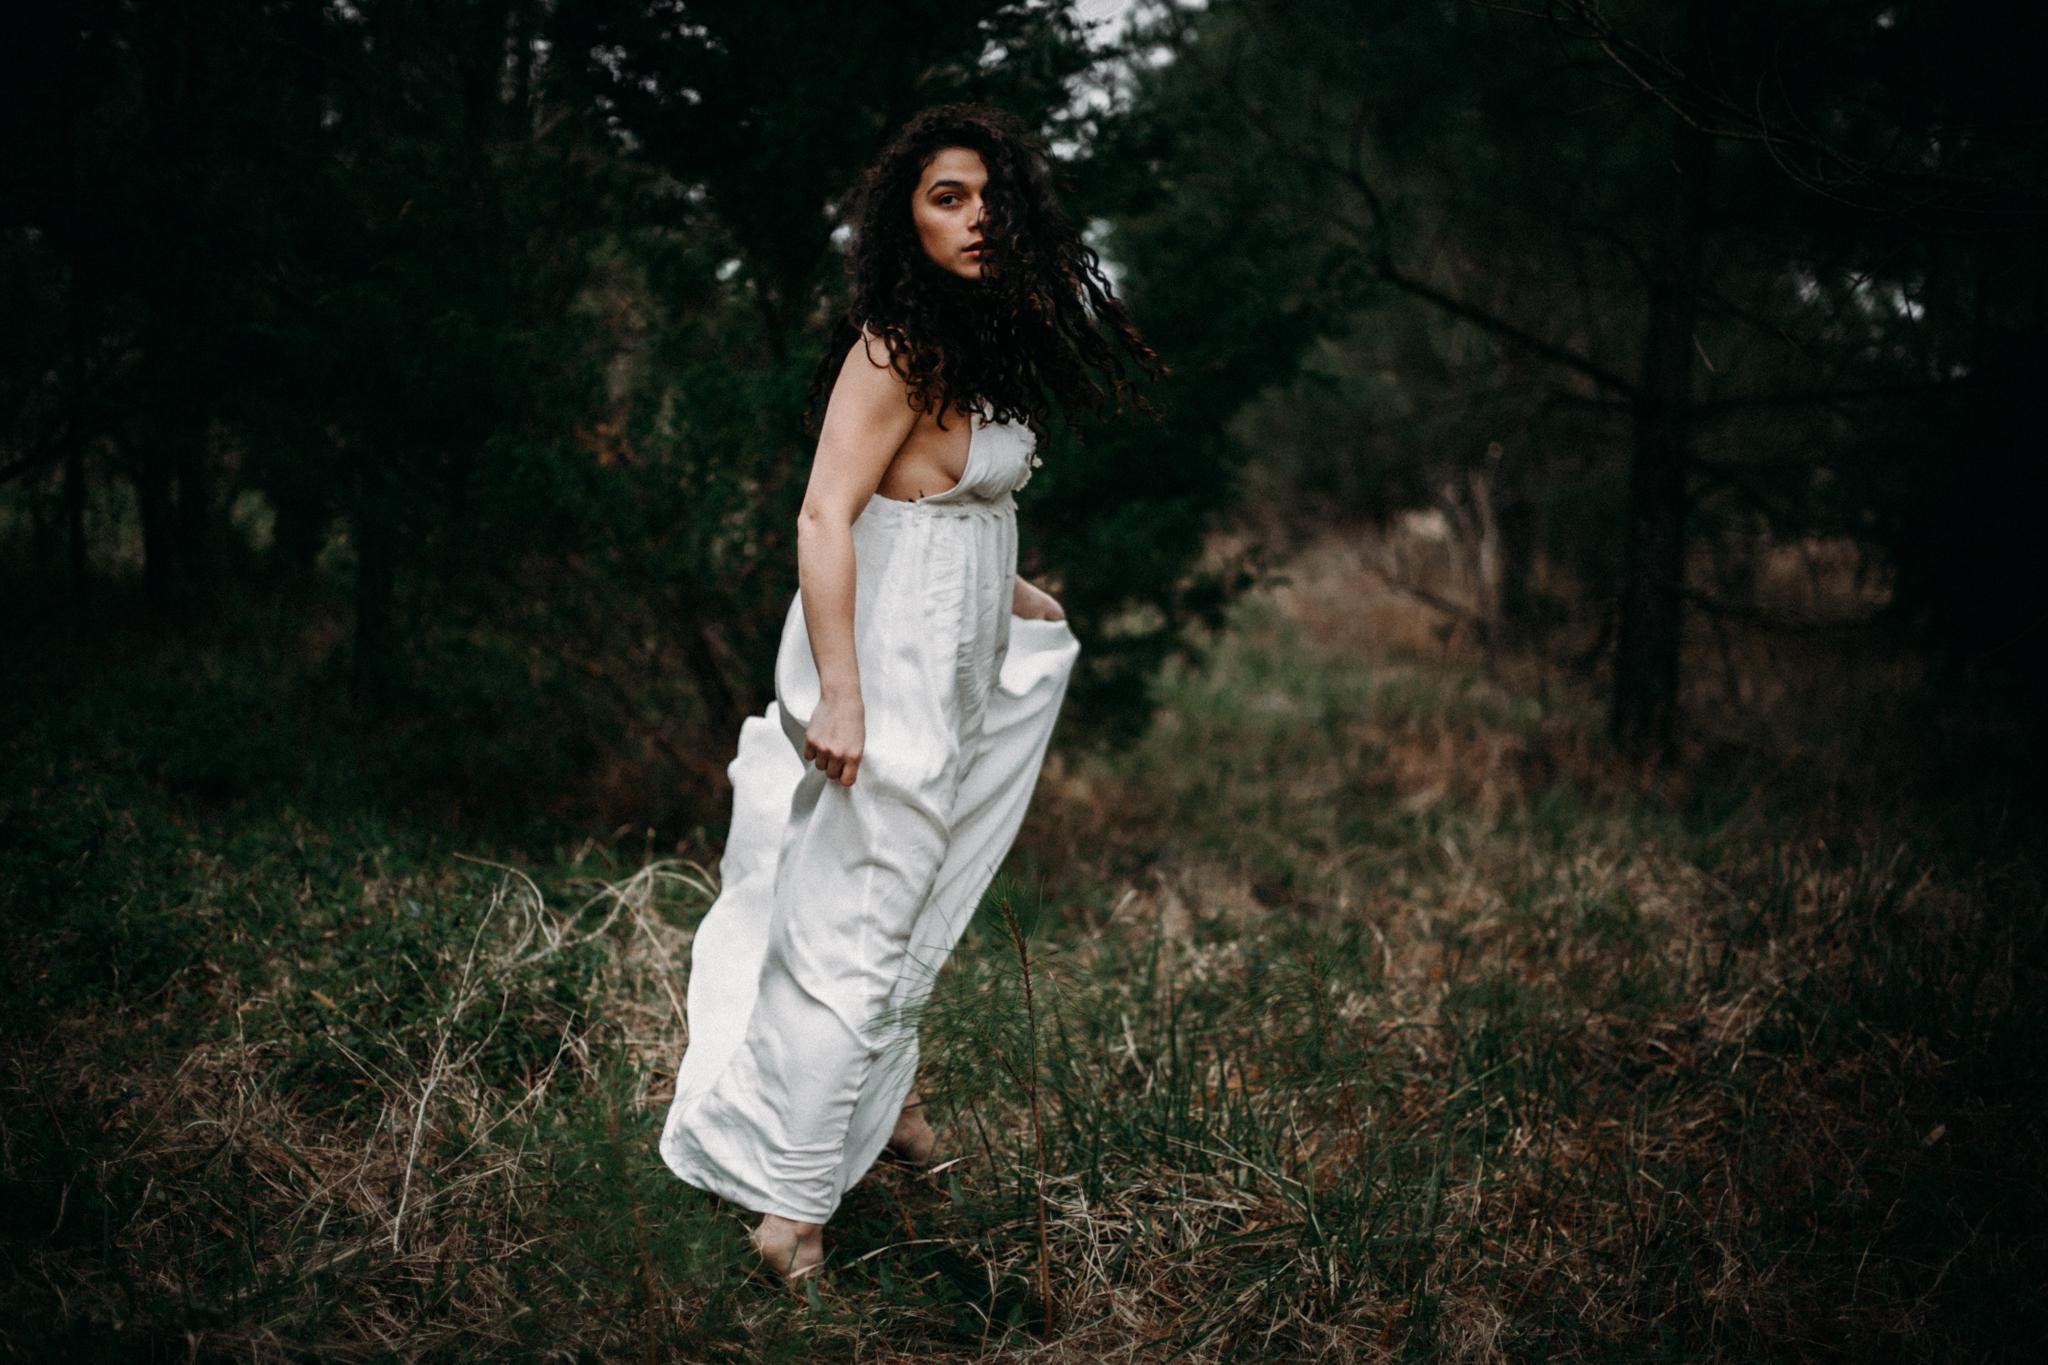 Jessica.VirginiaBeach.Virginia.Boudoir.emotivestorytelling-32.JPG